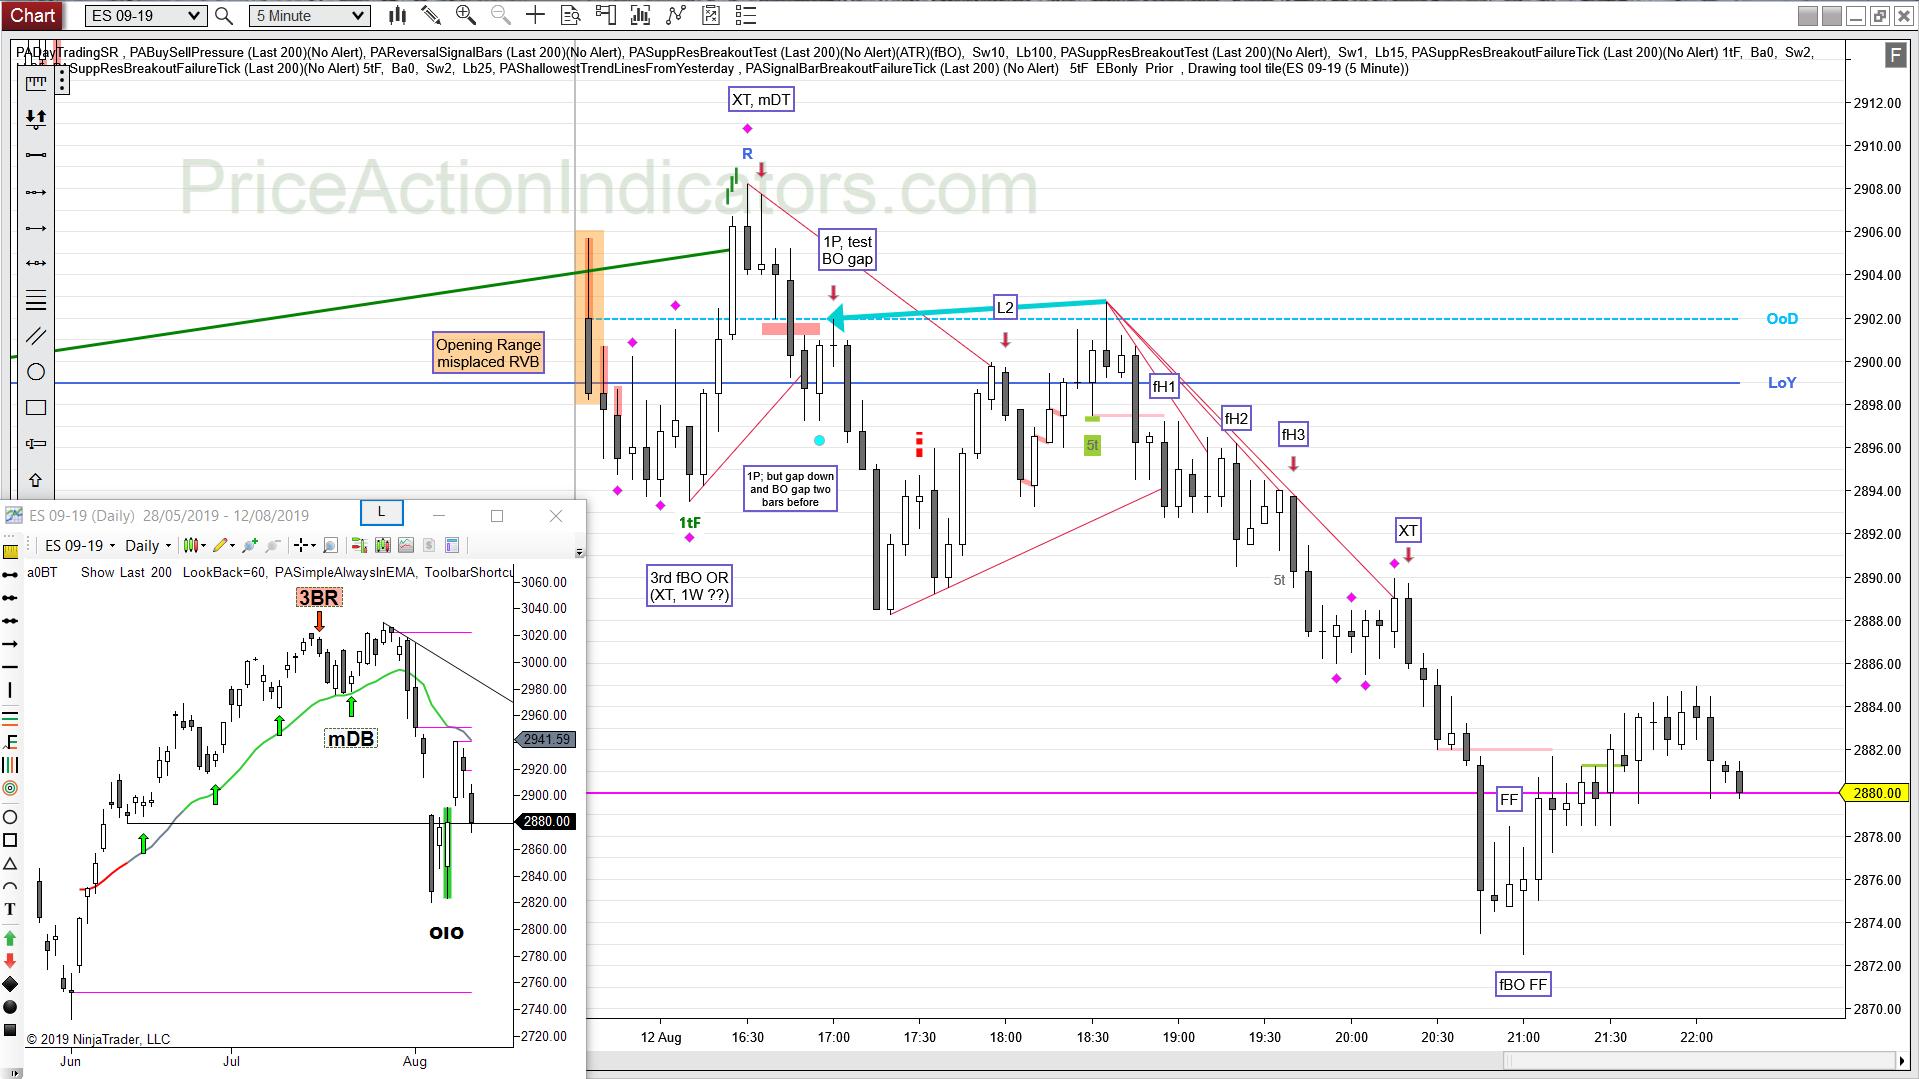 fH2 – Price Action Indicators